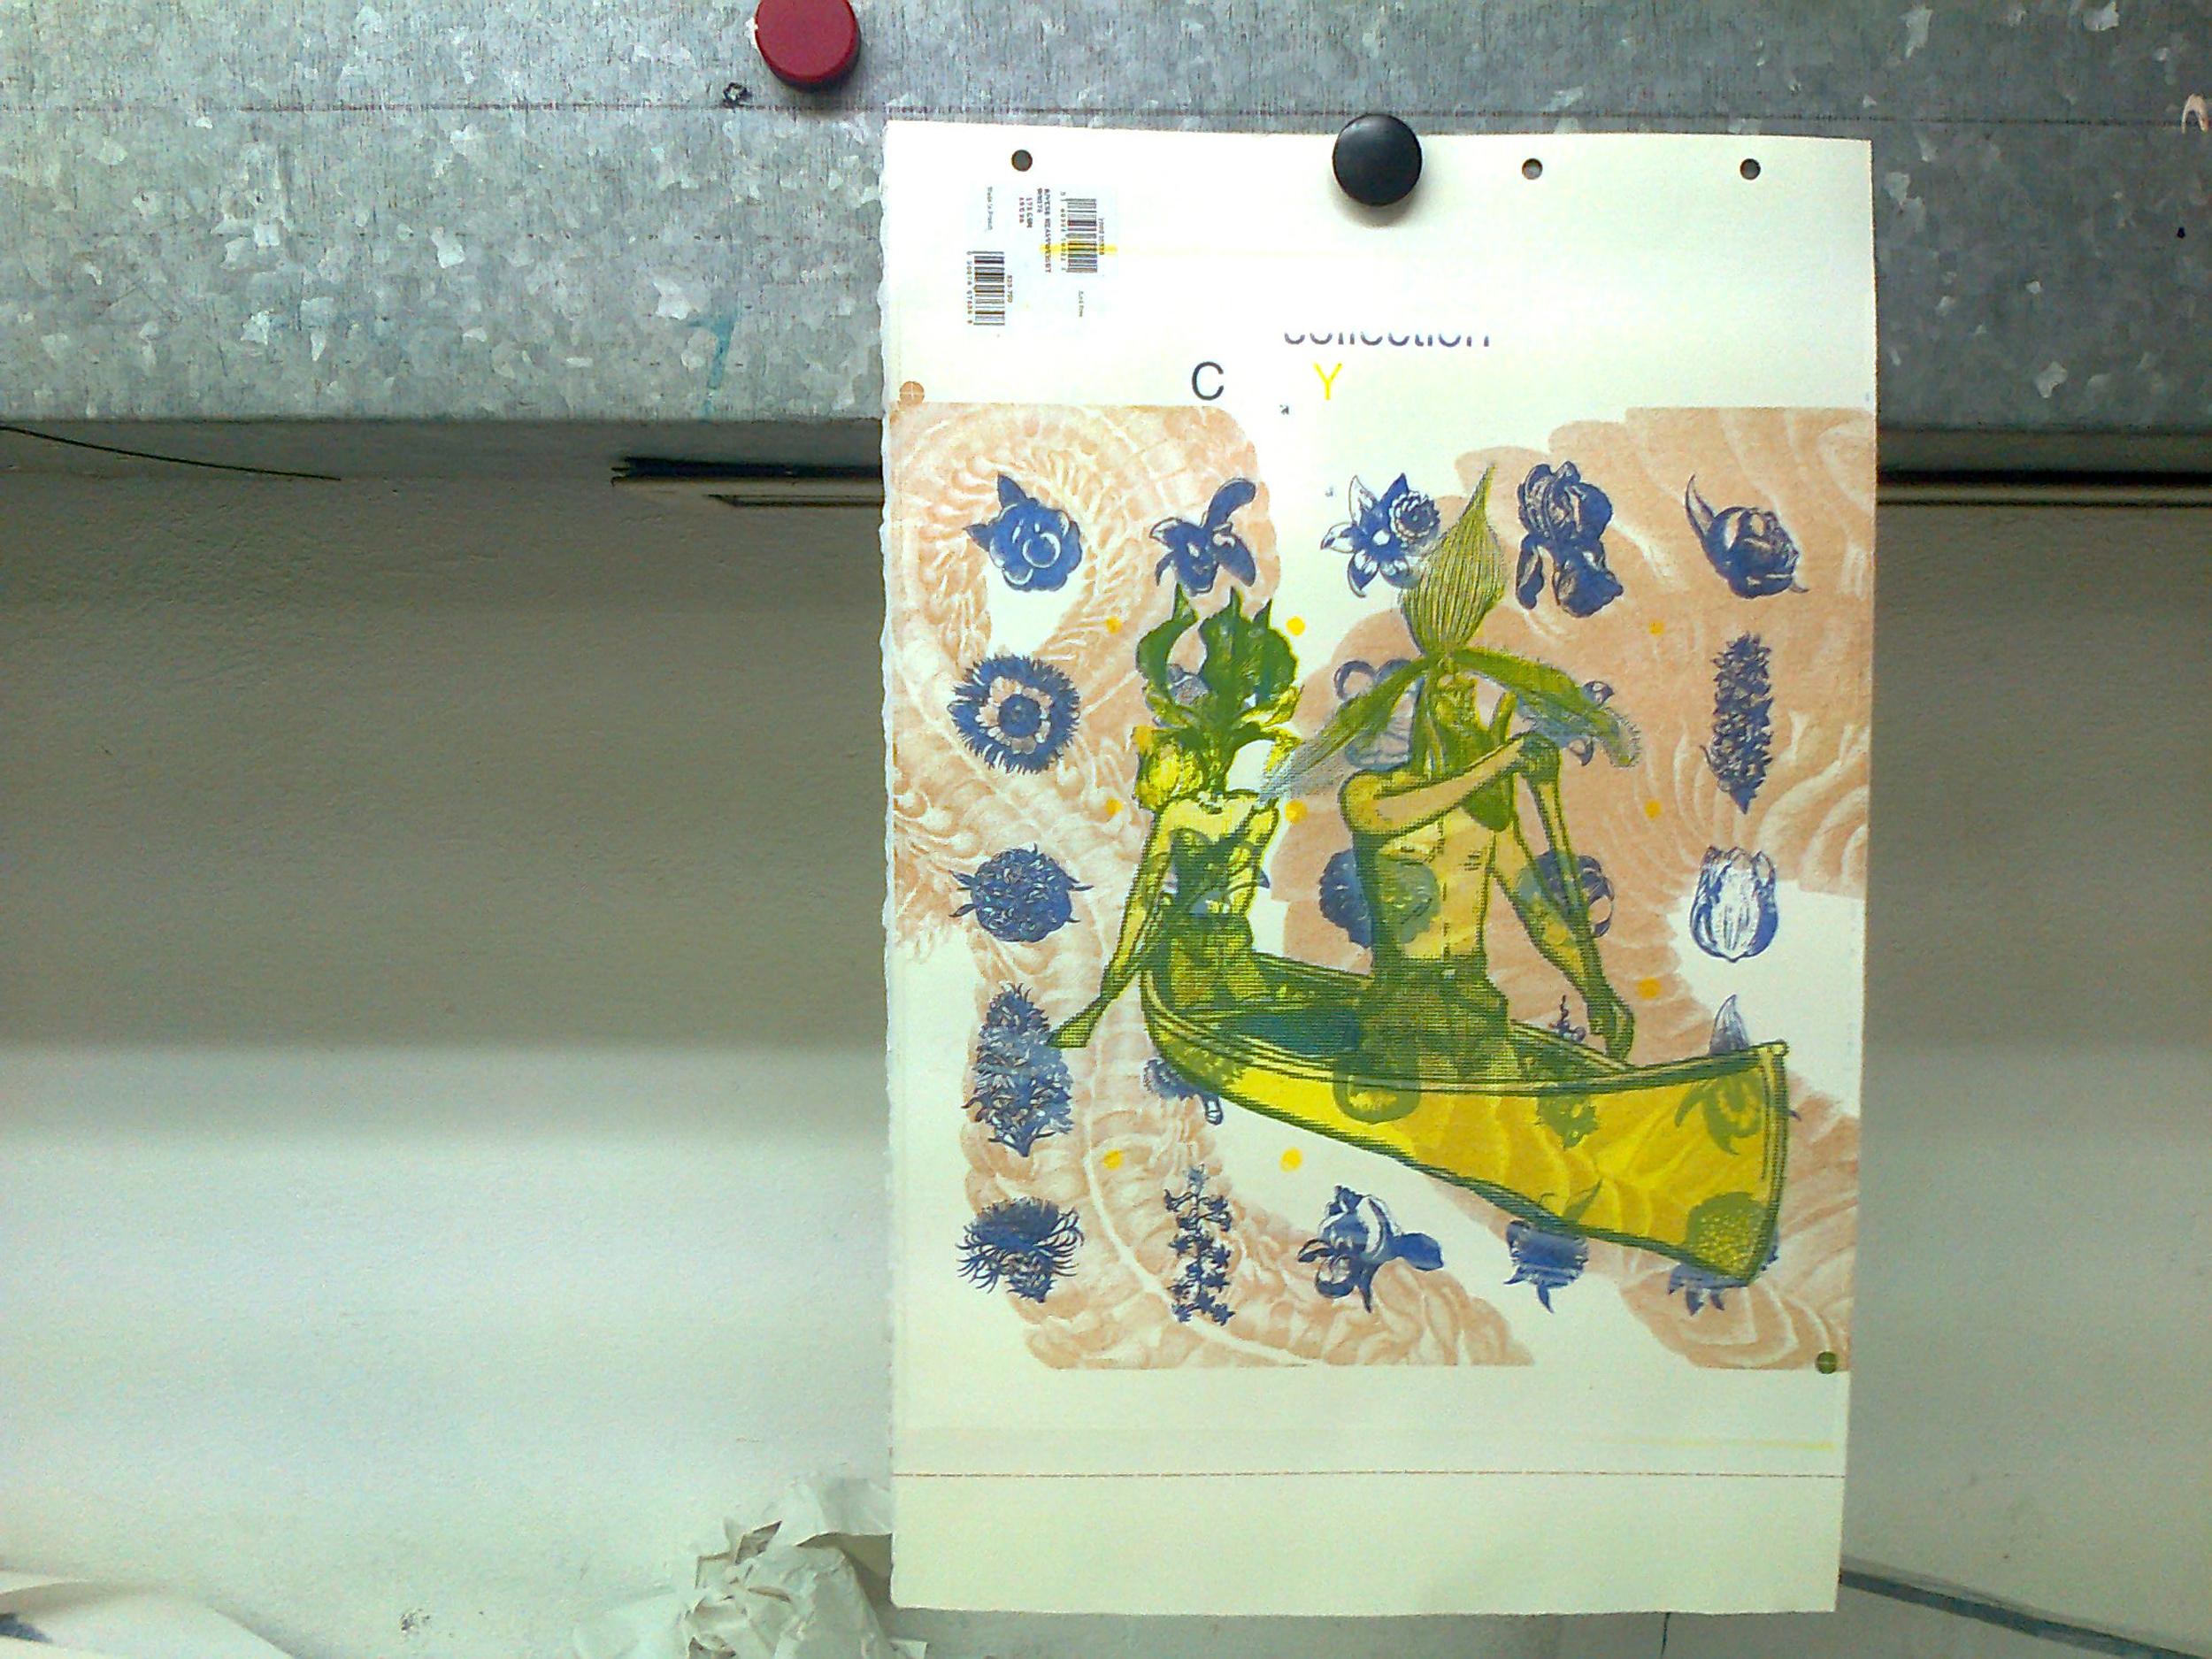 testimonial-i-iii-iii-progress-documentation-cellphone-sketchbook-043.jpg